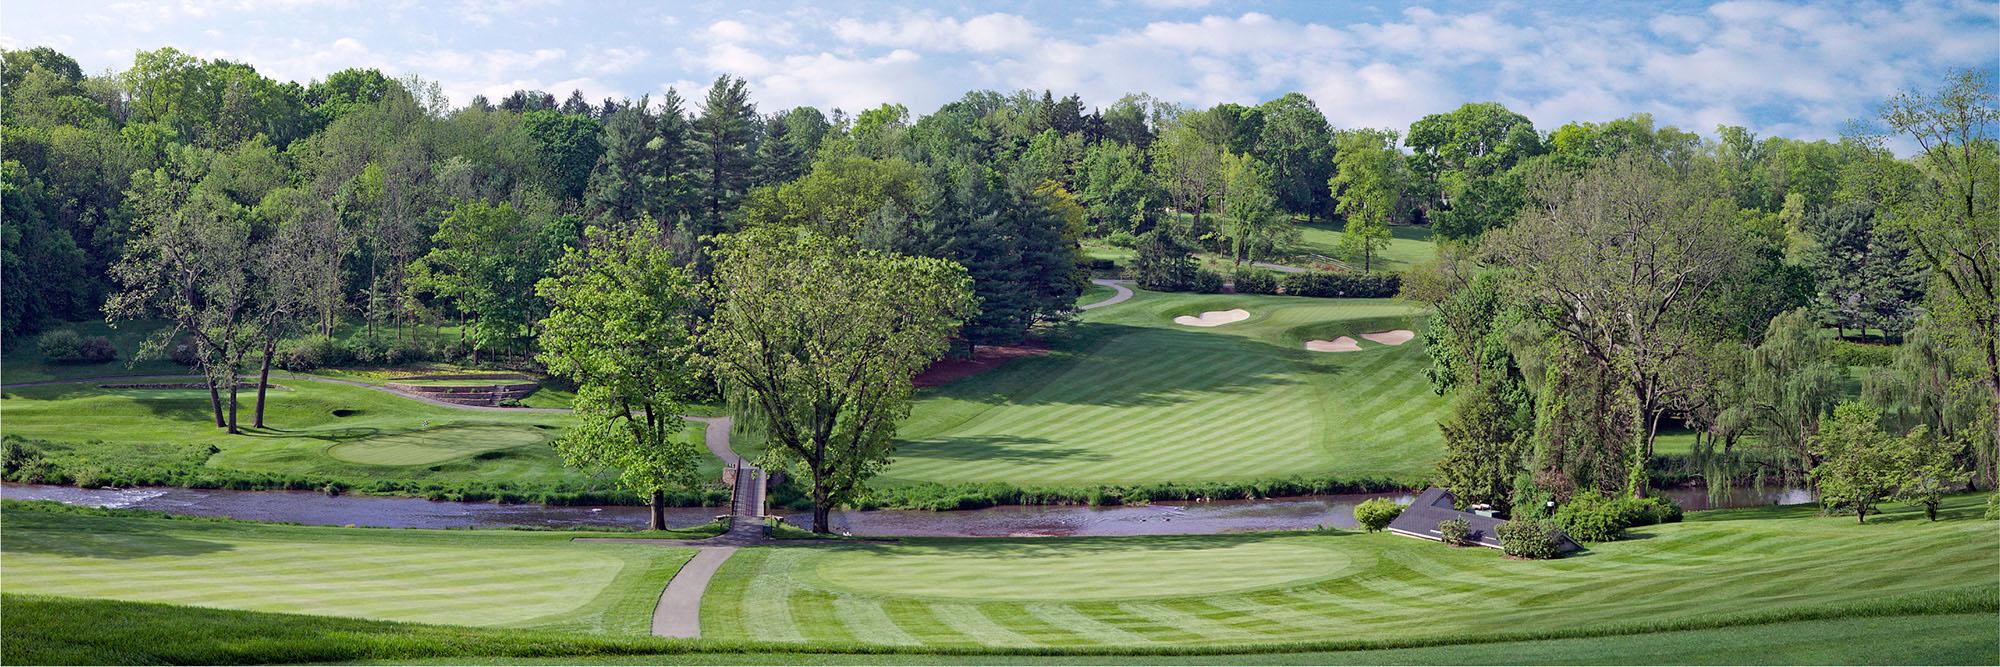 Golf Course Image - Lehigh Country Club No. 4